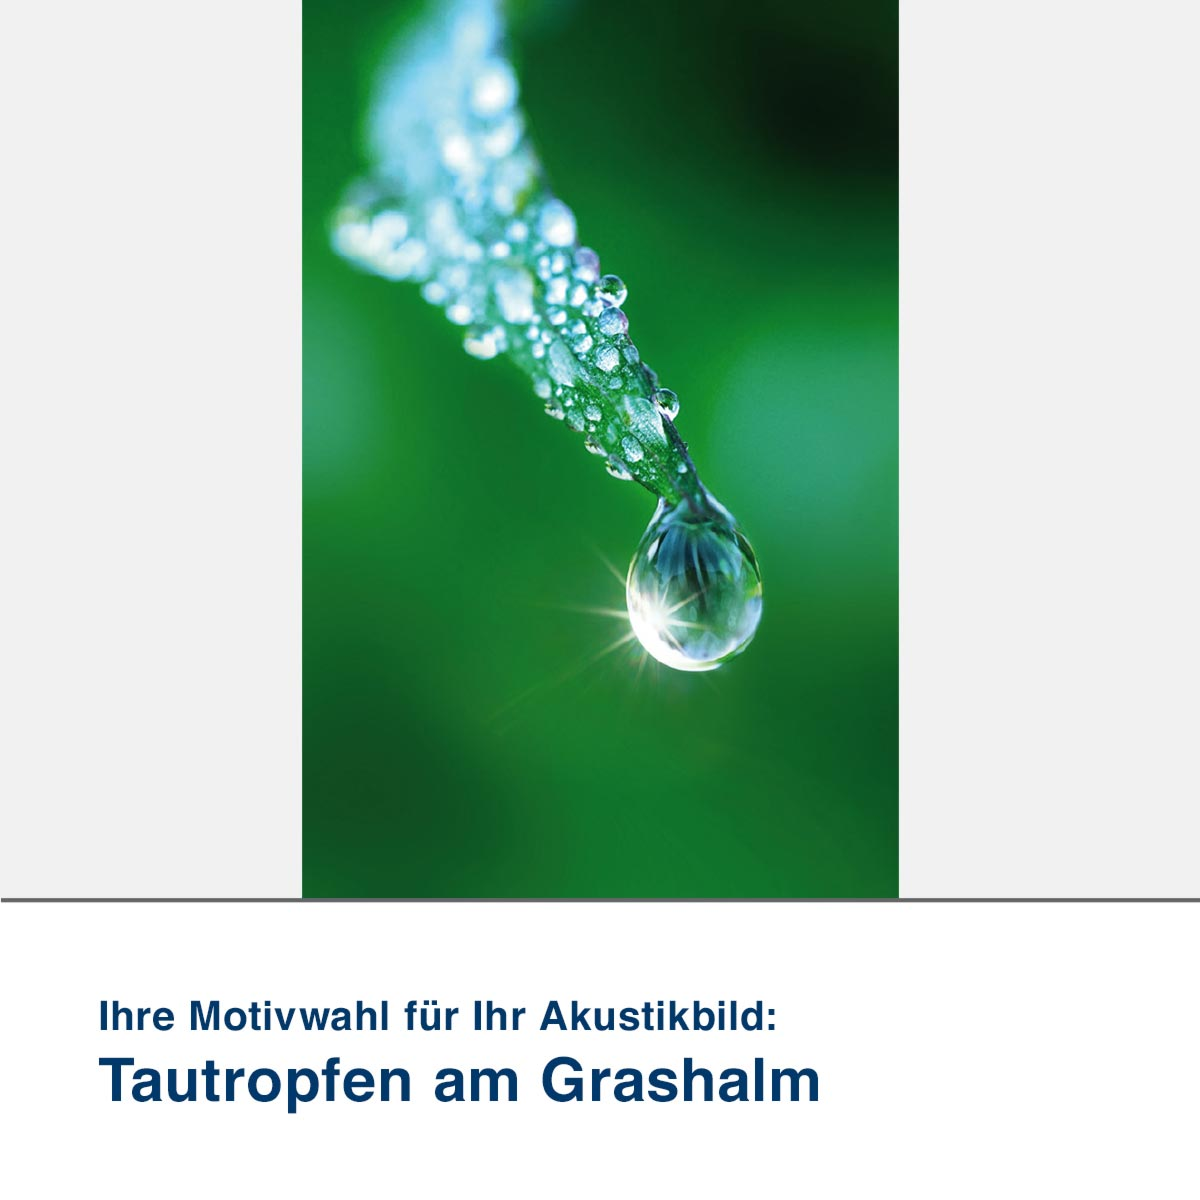 Akustikbild Motiv Tautropfen am Grashalm